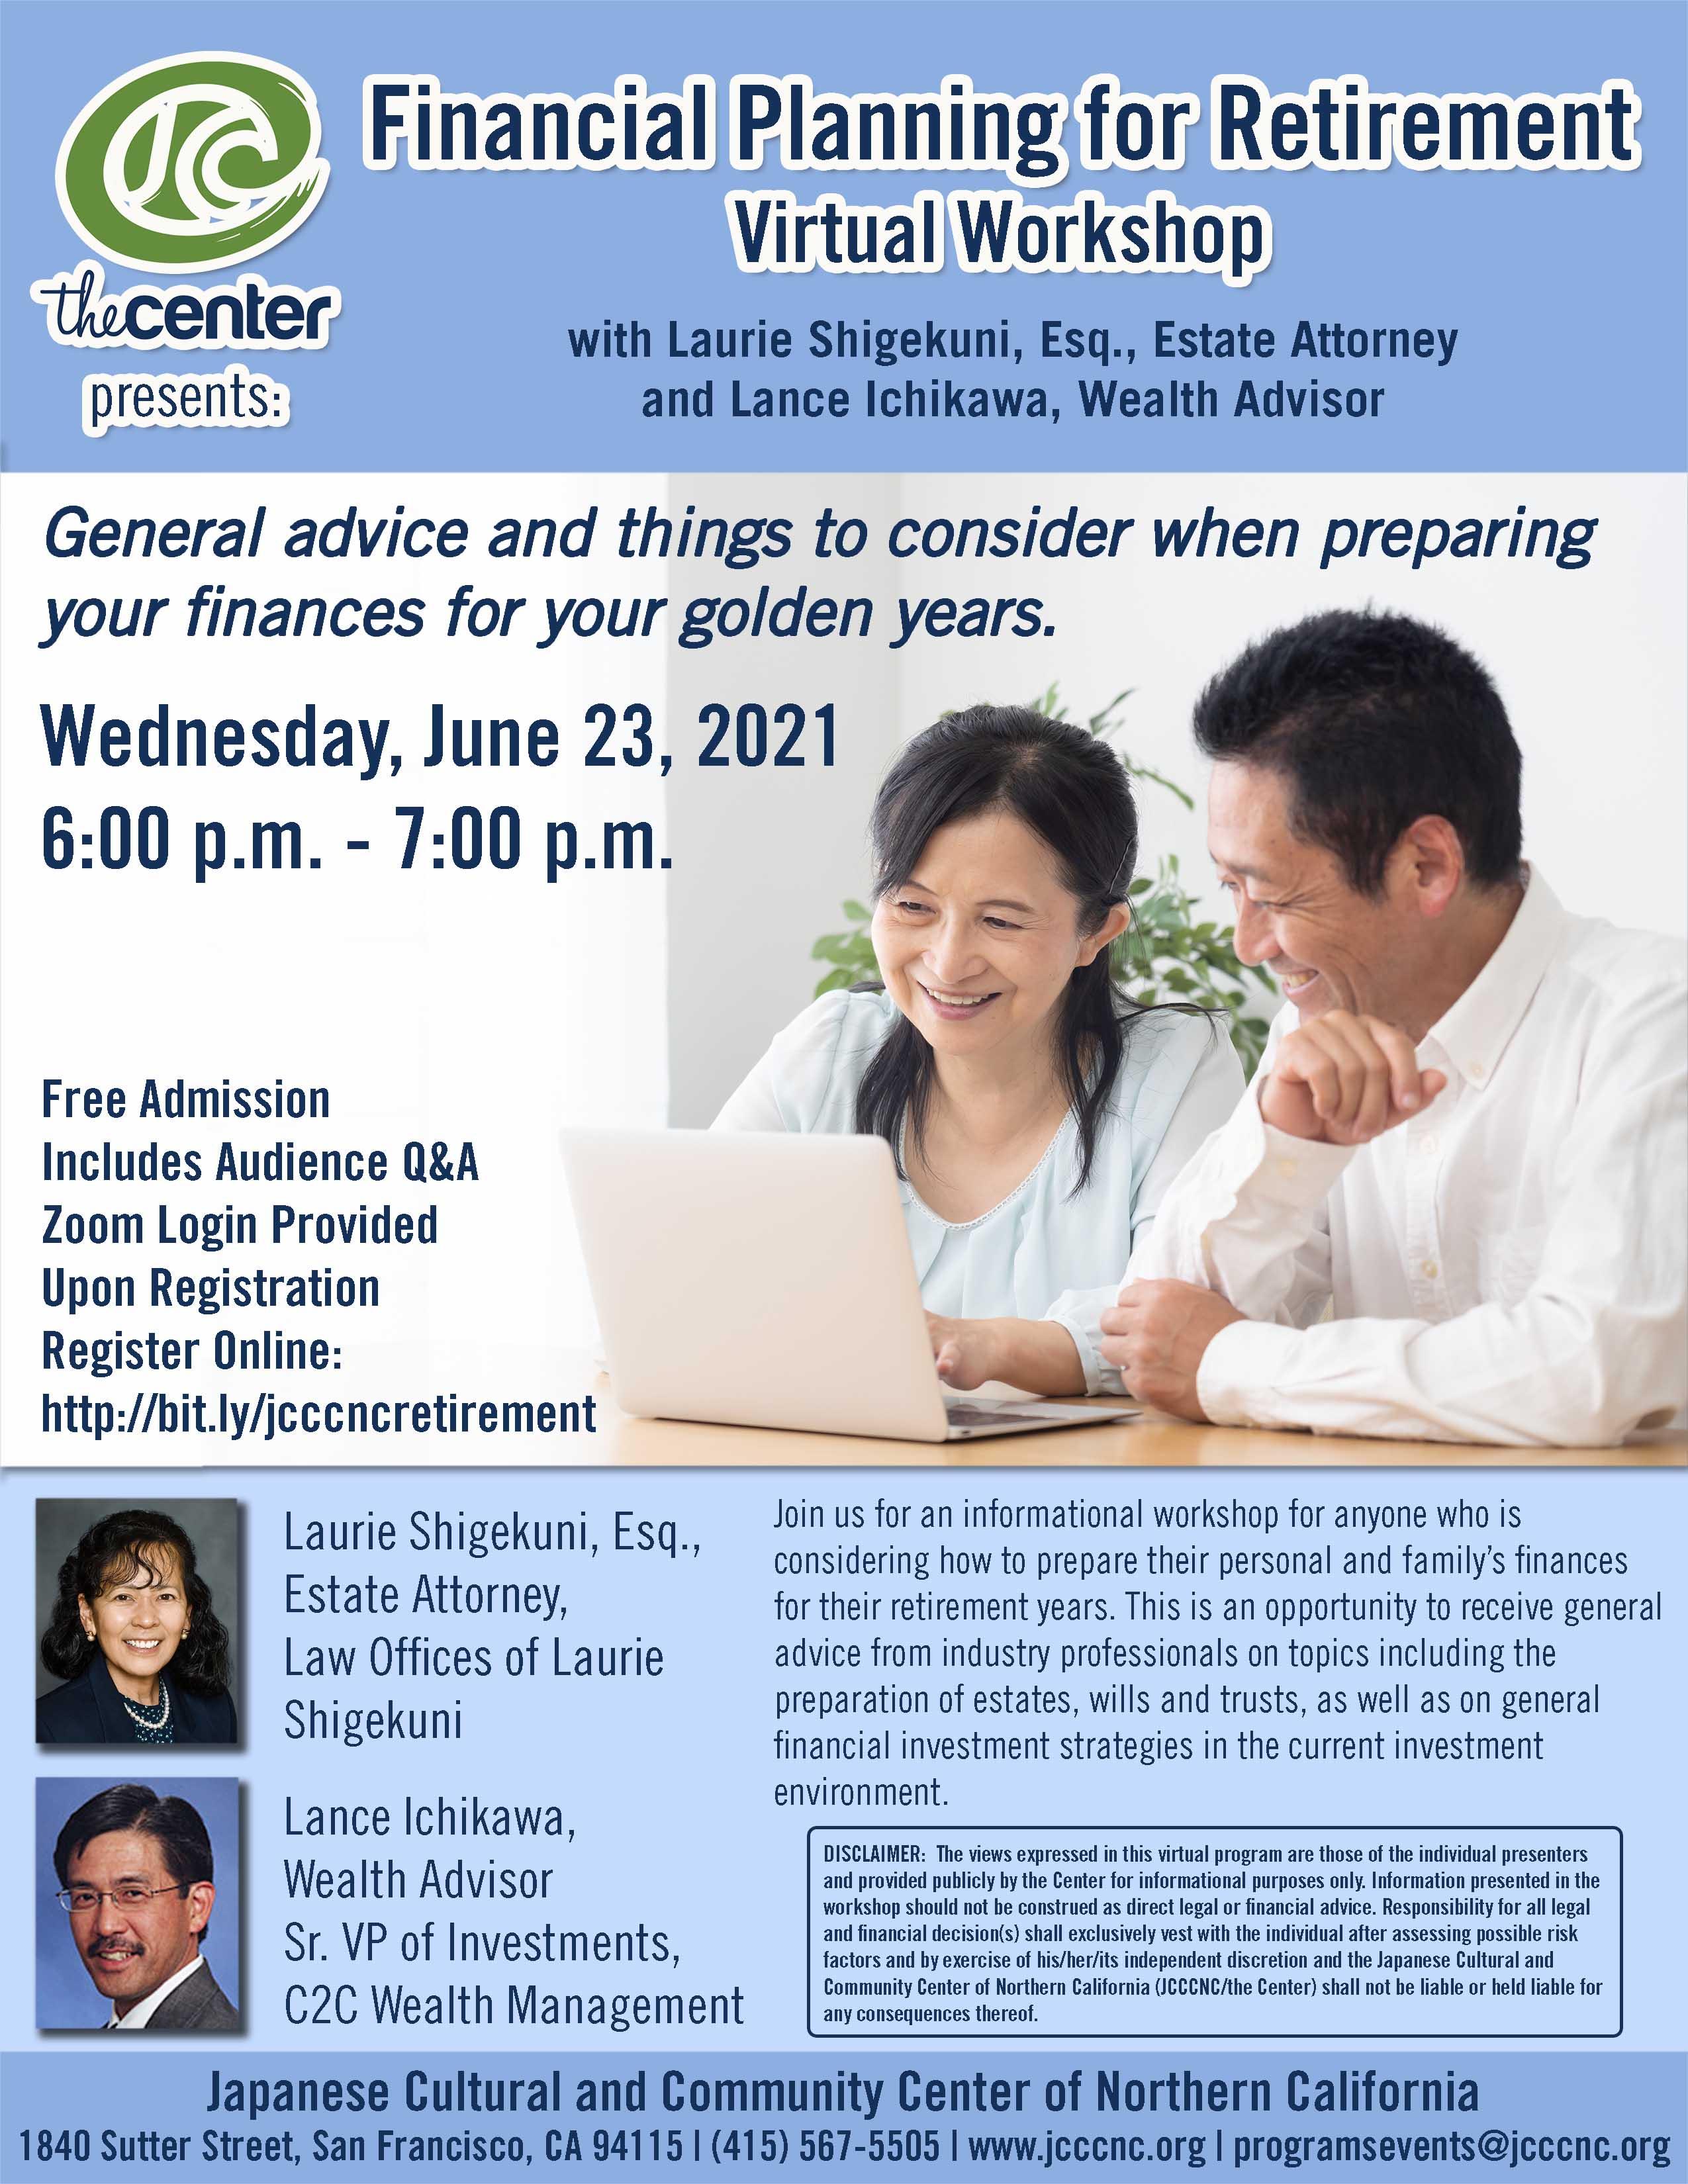 Financial Planning for Retirement Virtual Workshop with Estate Attorney Laurie Shigekuni and Wealth Advisor Lance Ichikawa